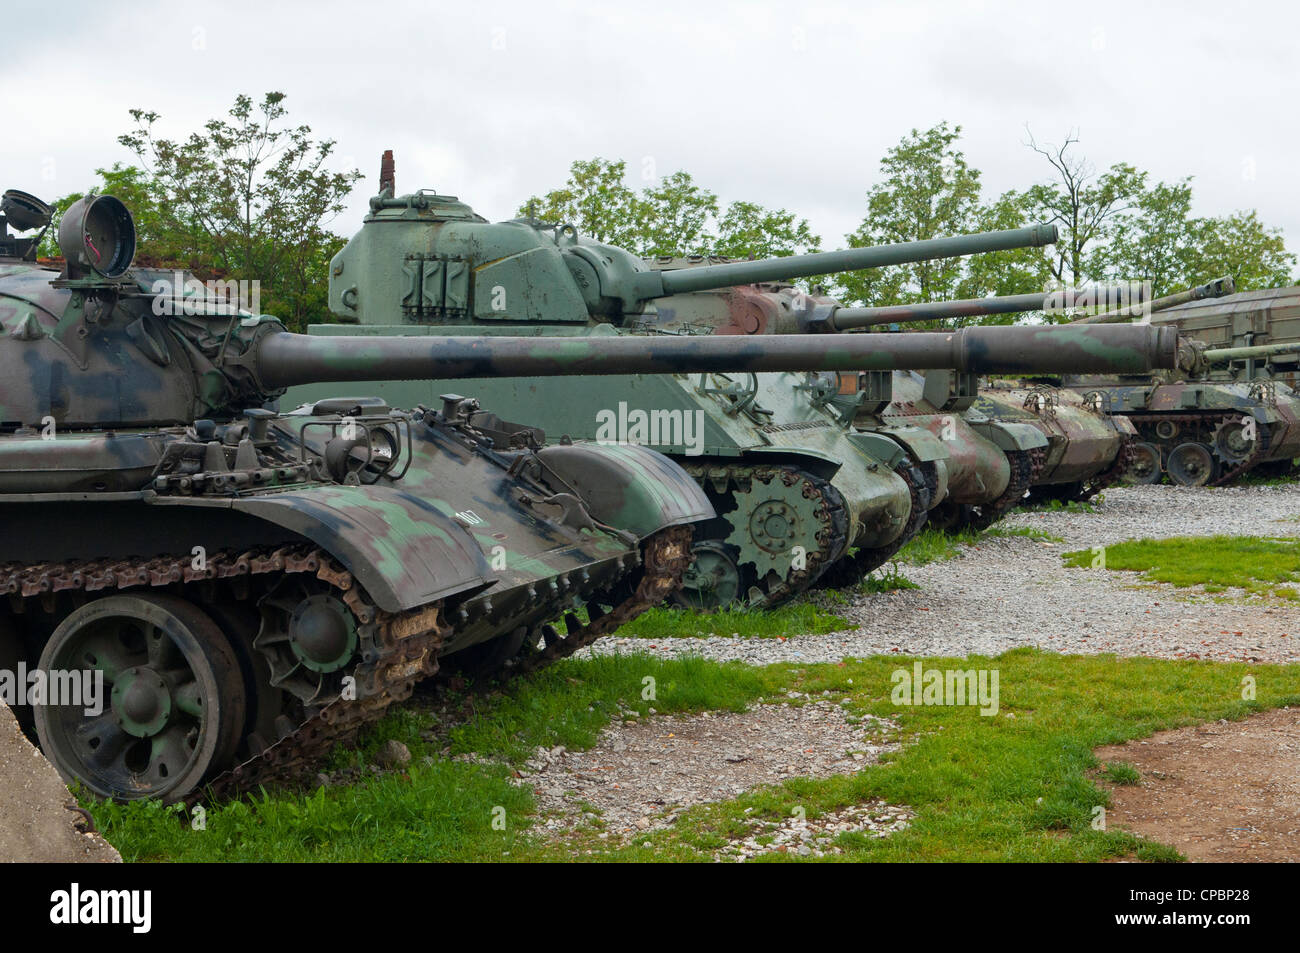 Open air war museum in Karlovac in Croatia, showing  military tanks. - Stock Image